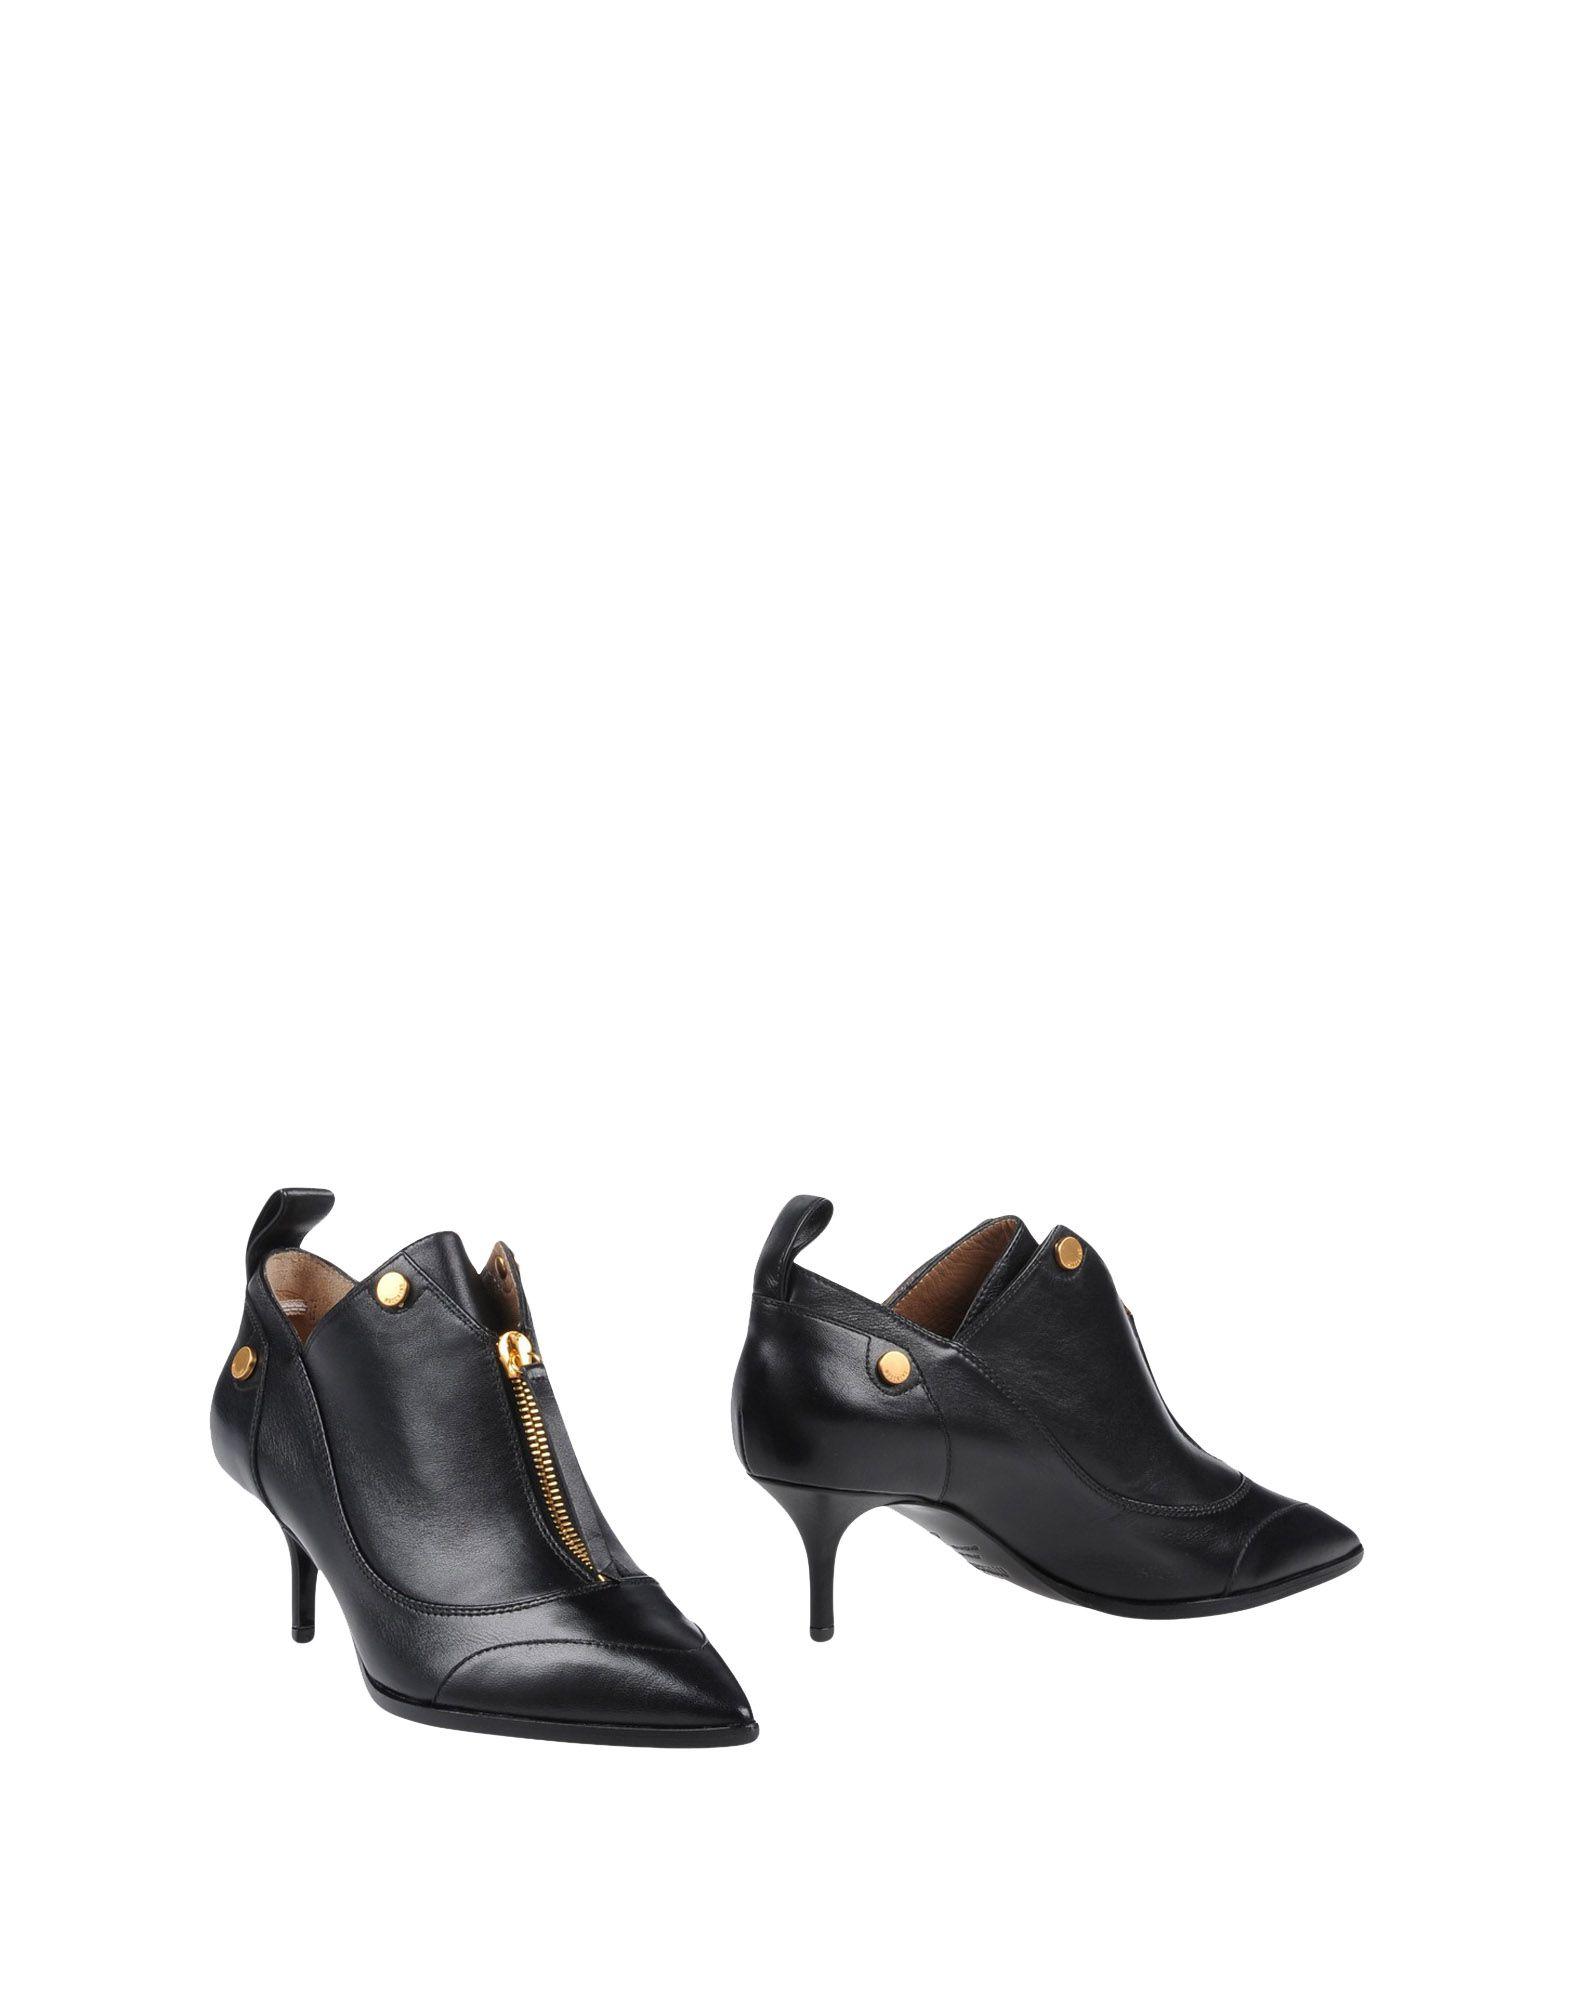 Moda Stivaletti Moschino Donna - 11451176WA